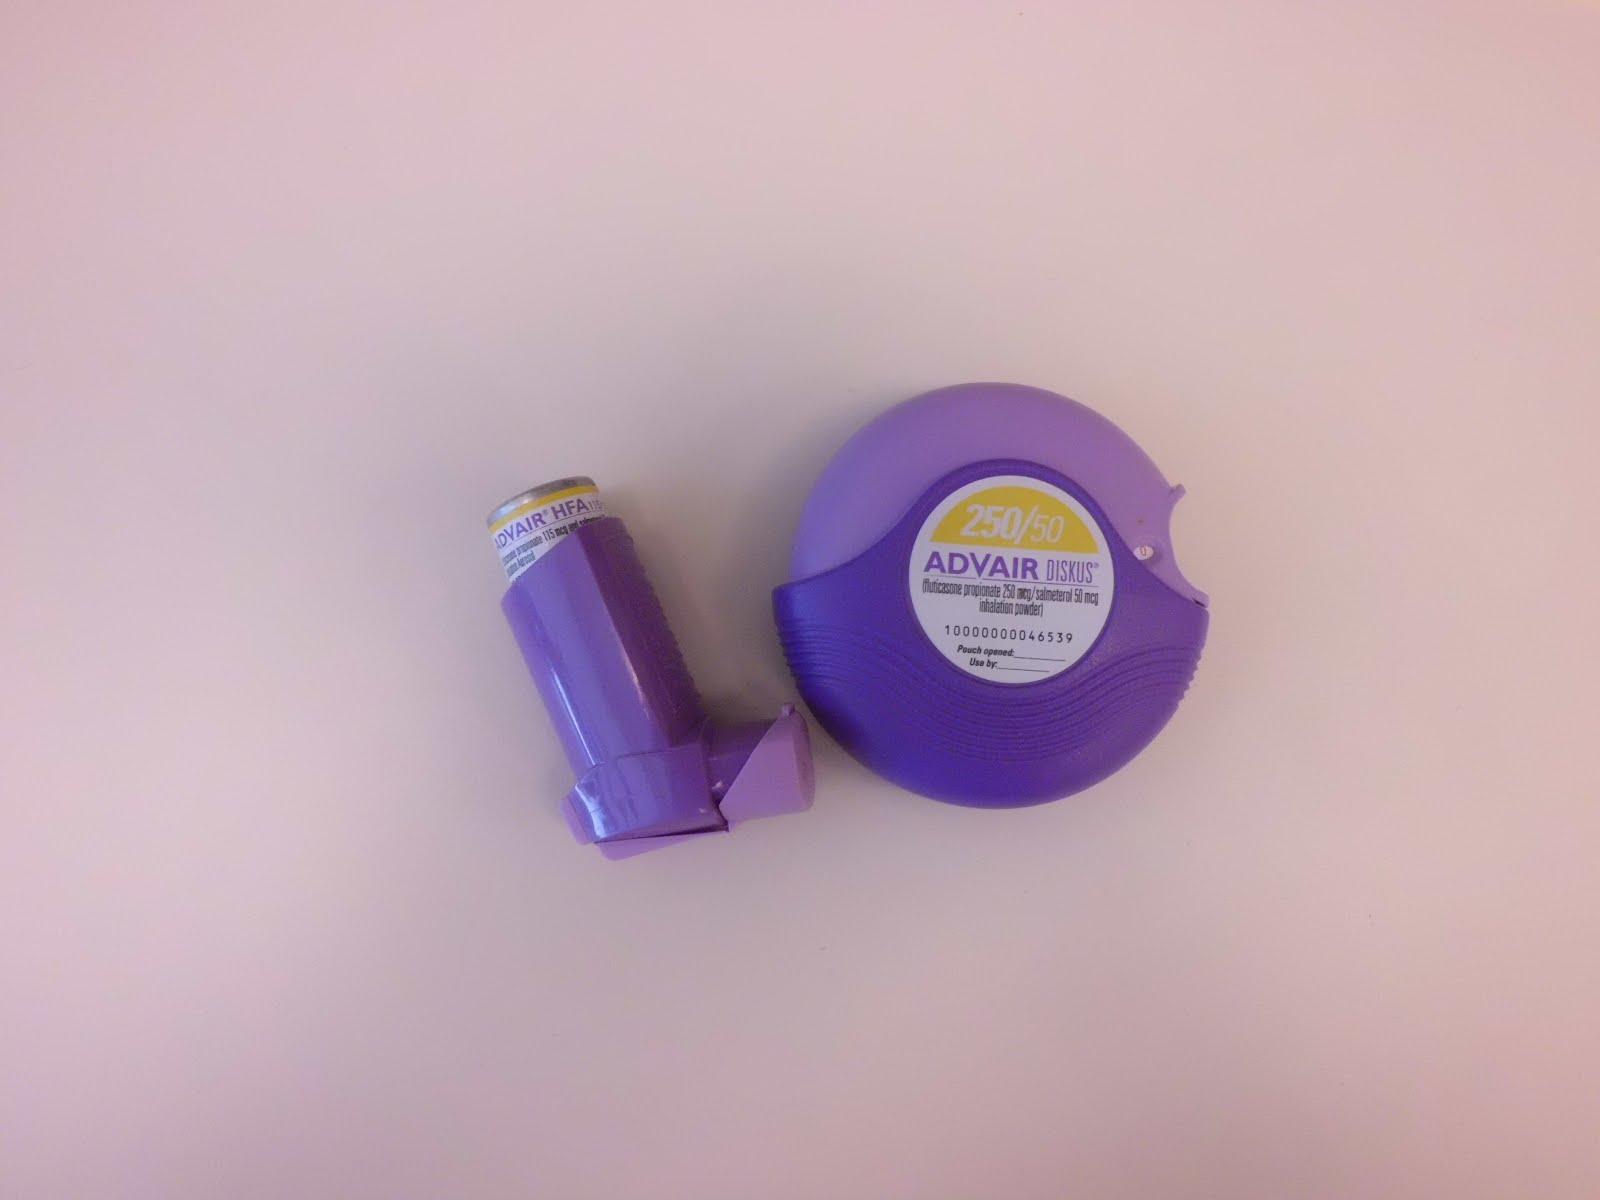 My Life as an Asthma Mom: Advair inhaler instead of the disc